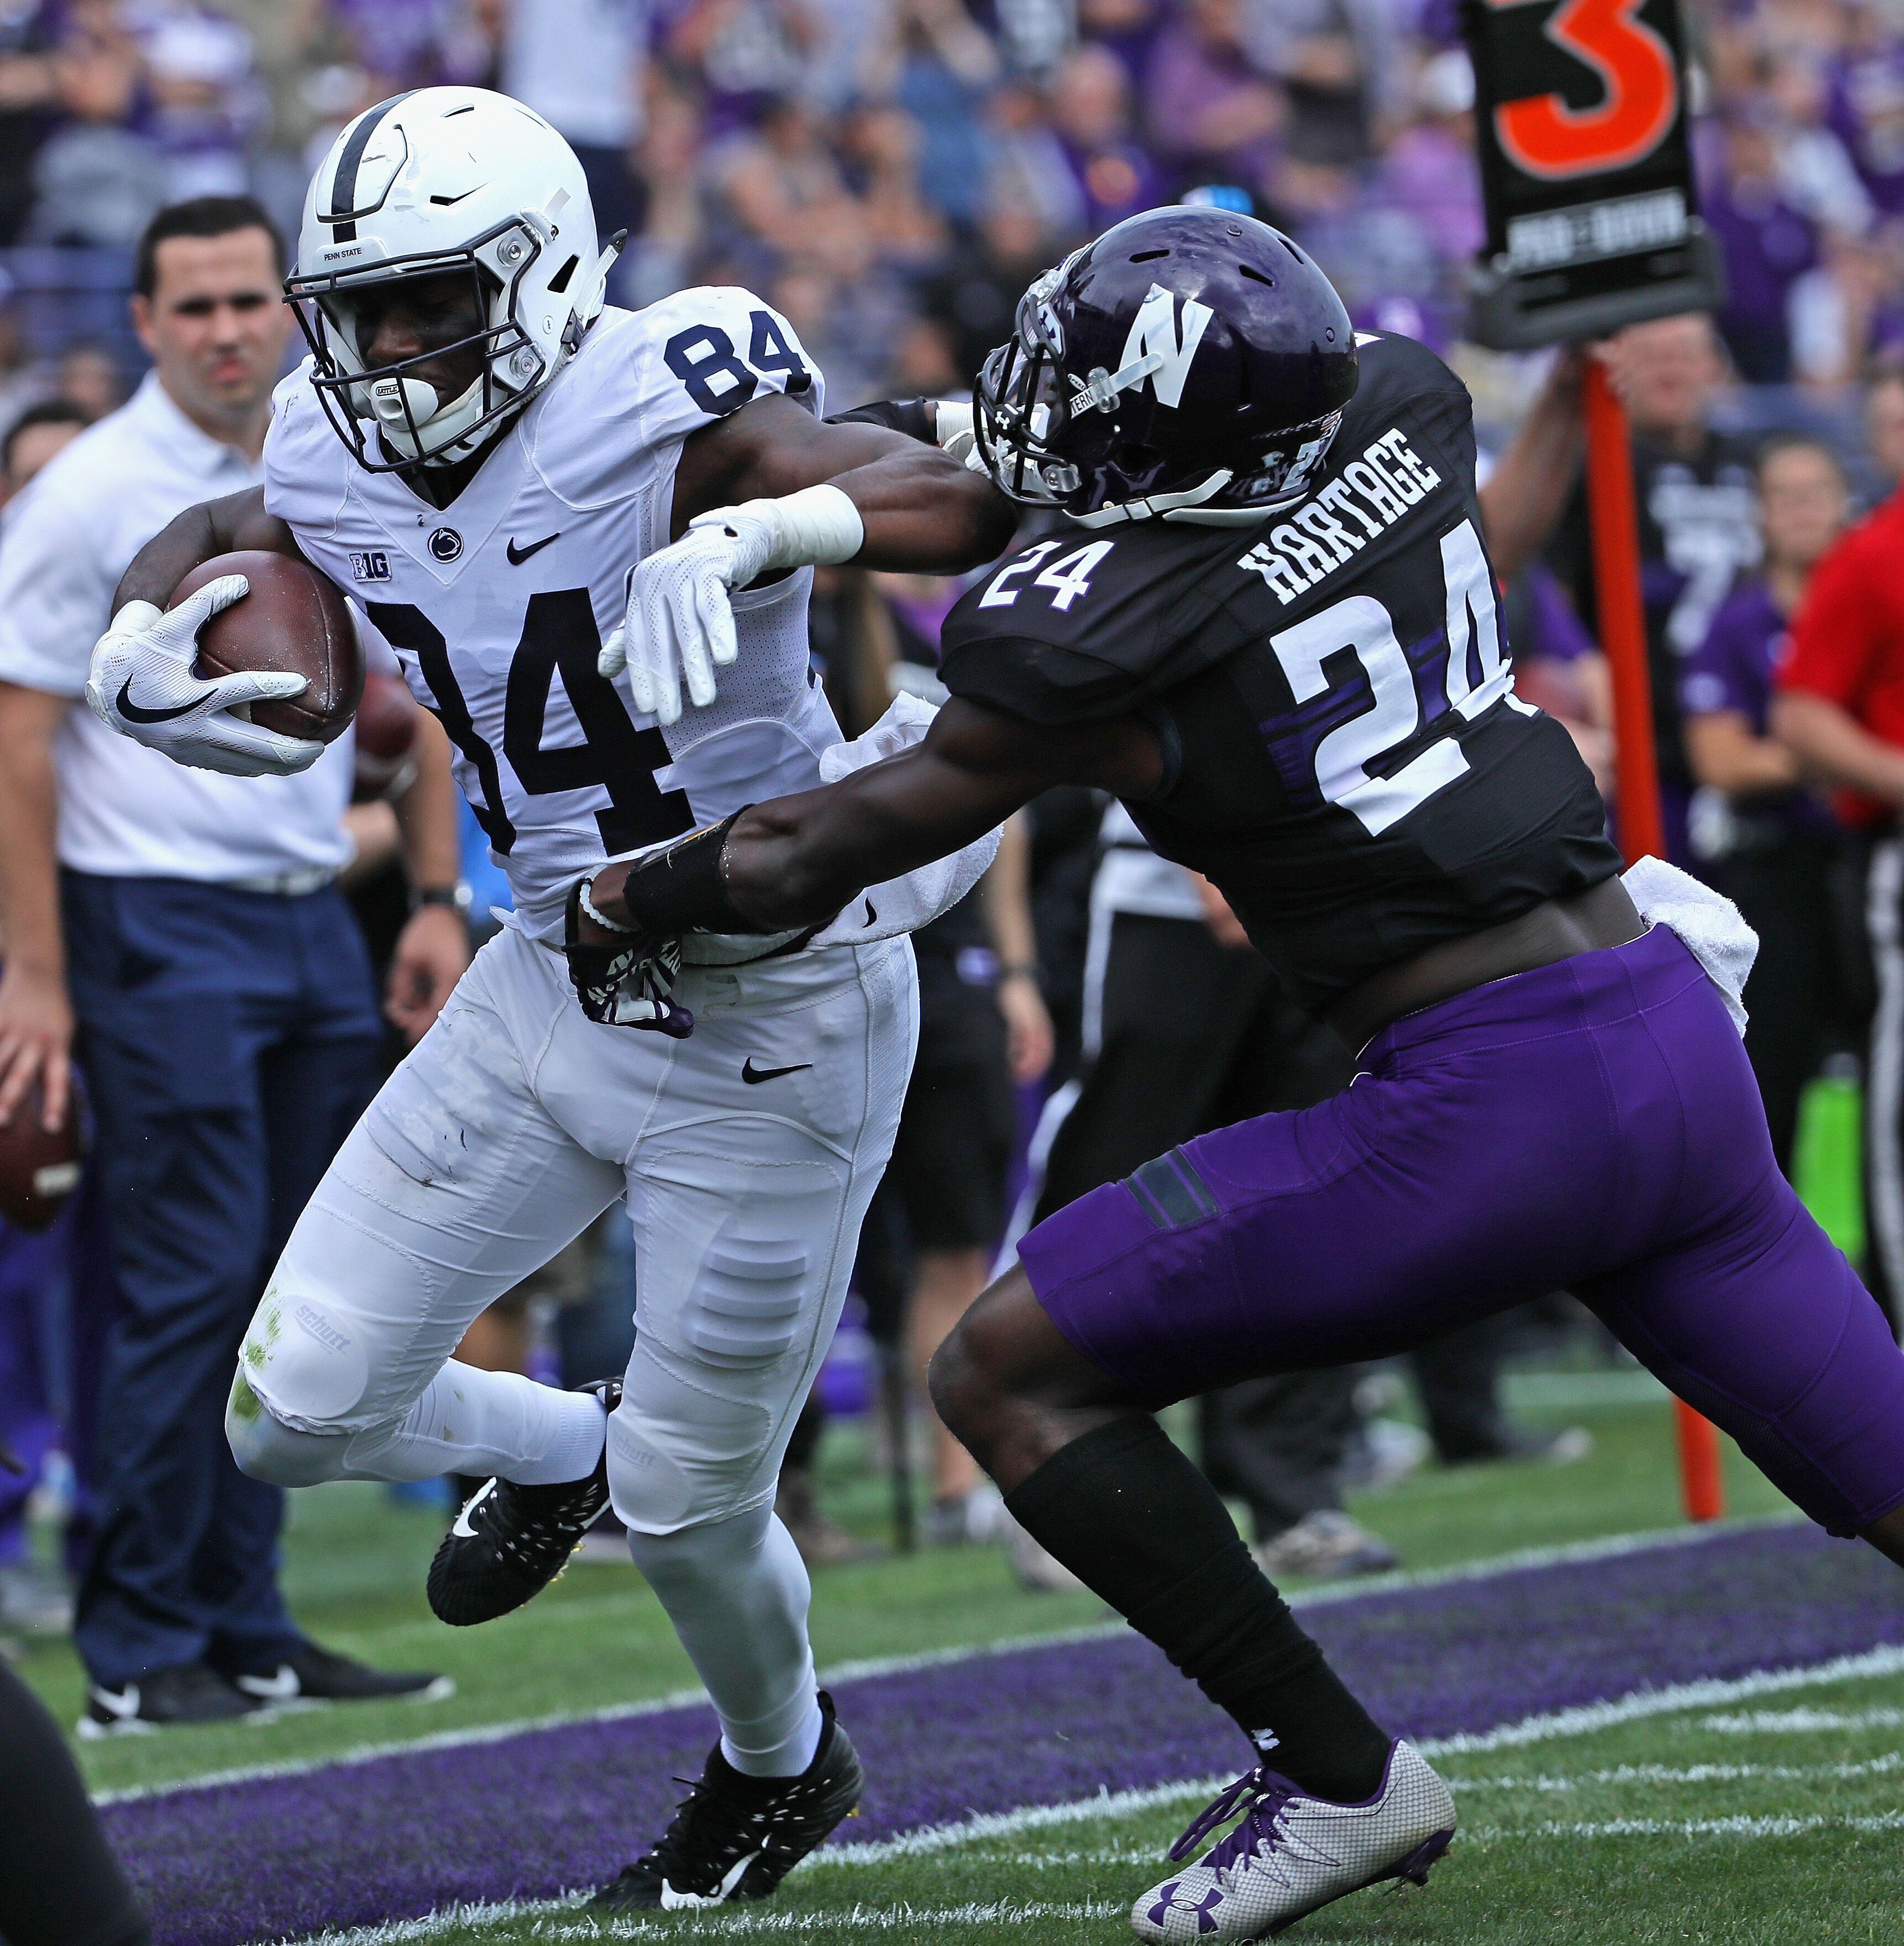 Penn State Football: Juwan Johnson 2017 regular season rewind